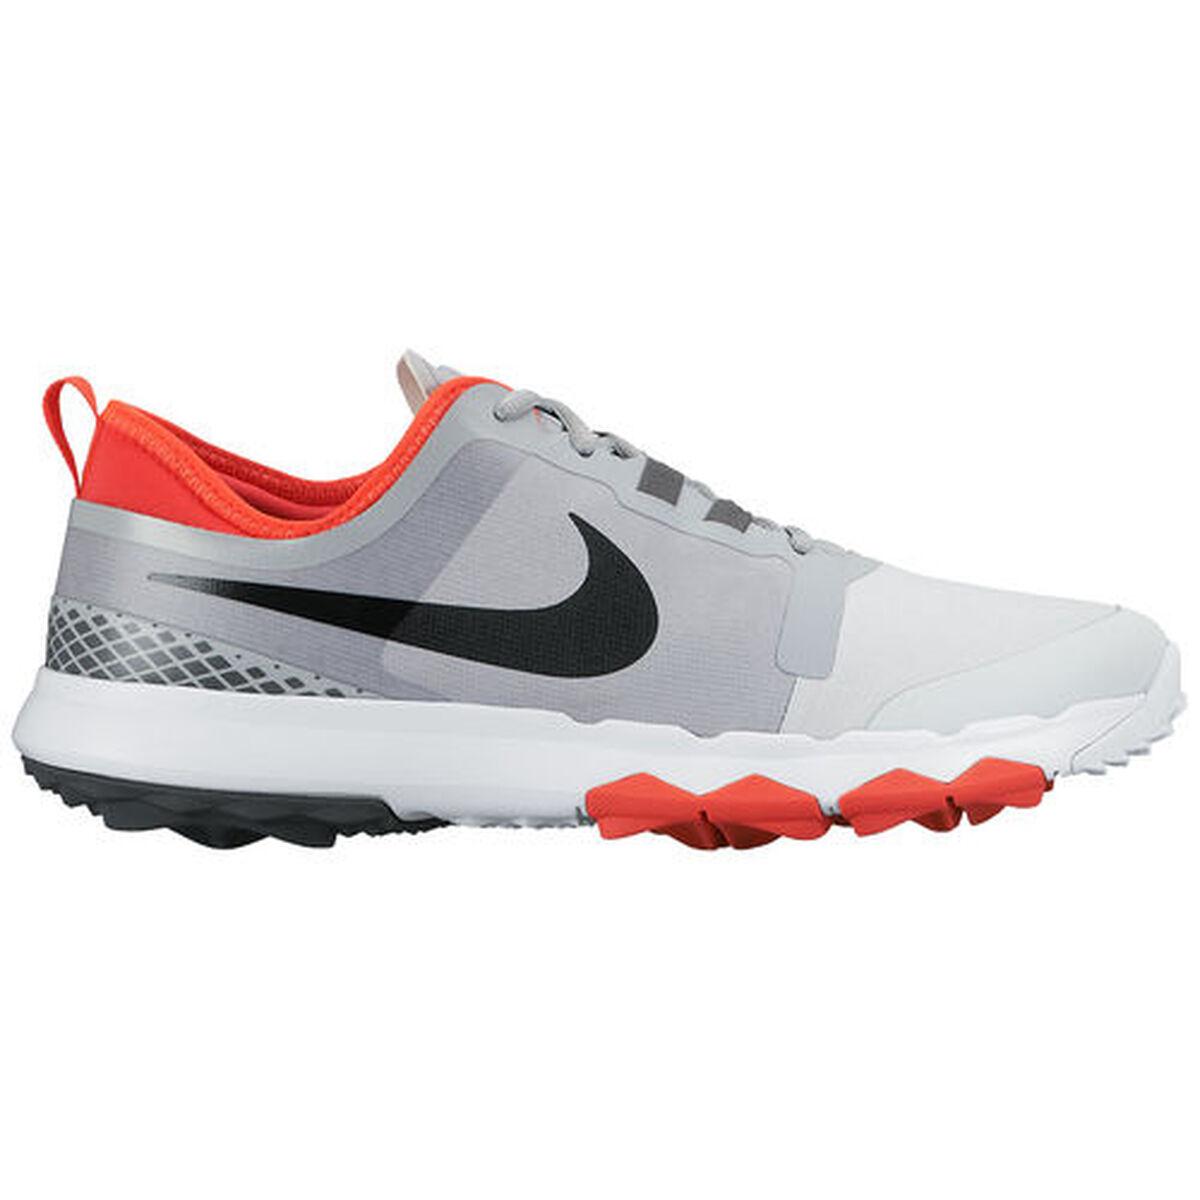 bc1b0b33517 Images. Nike FI Impact 2 Men  39 s Golf Shoe ...